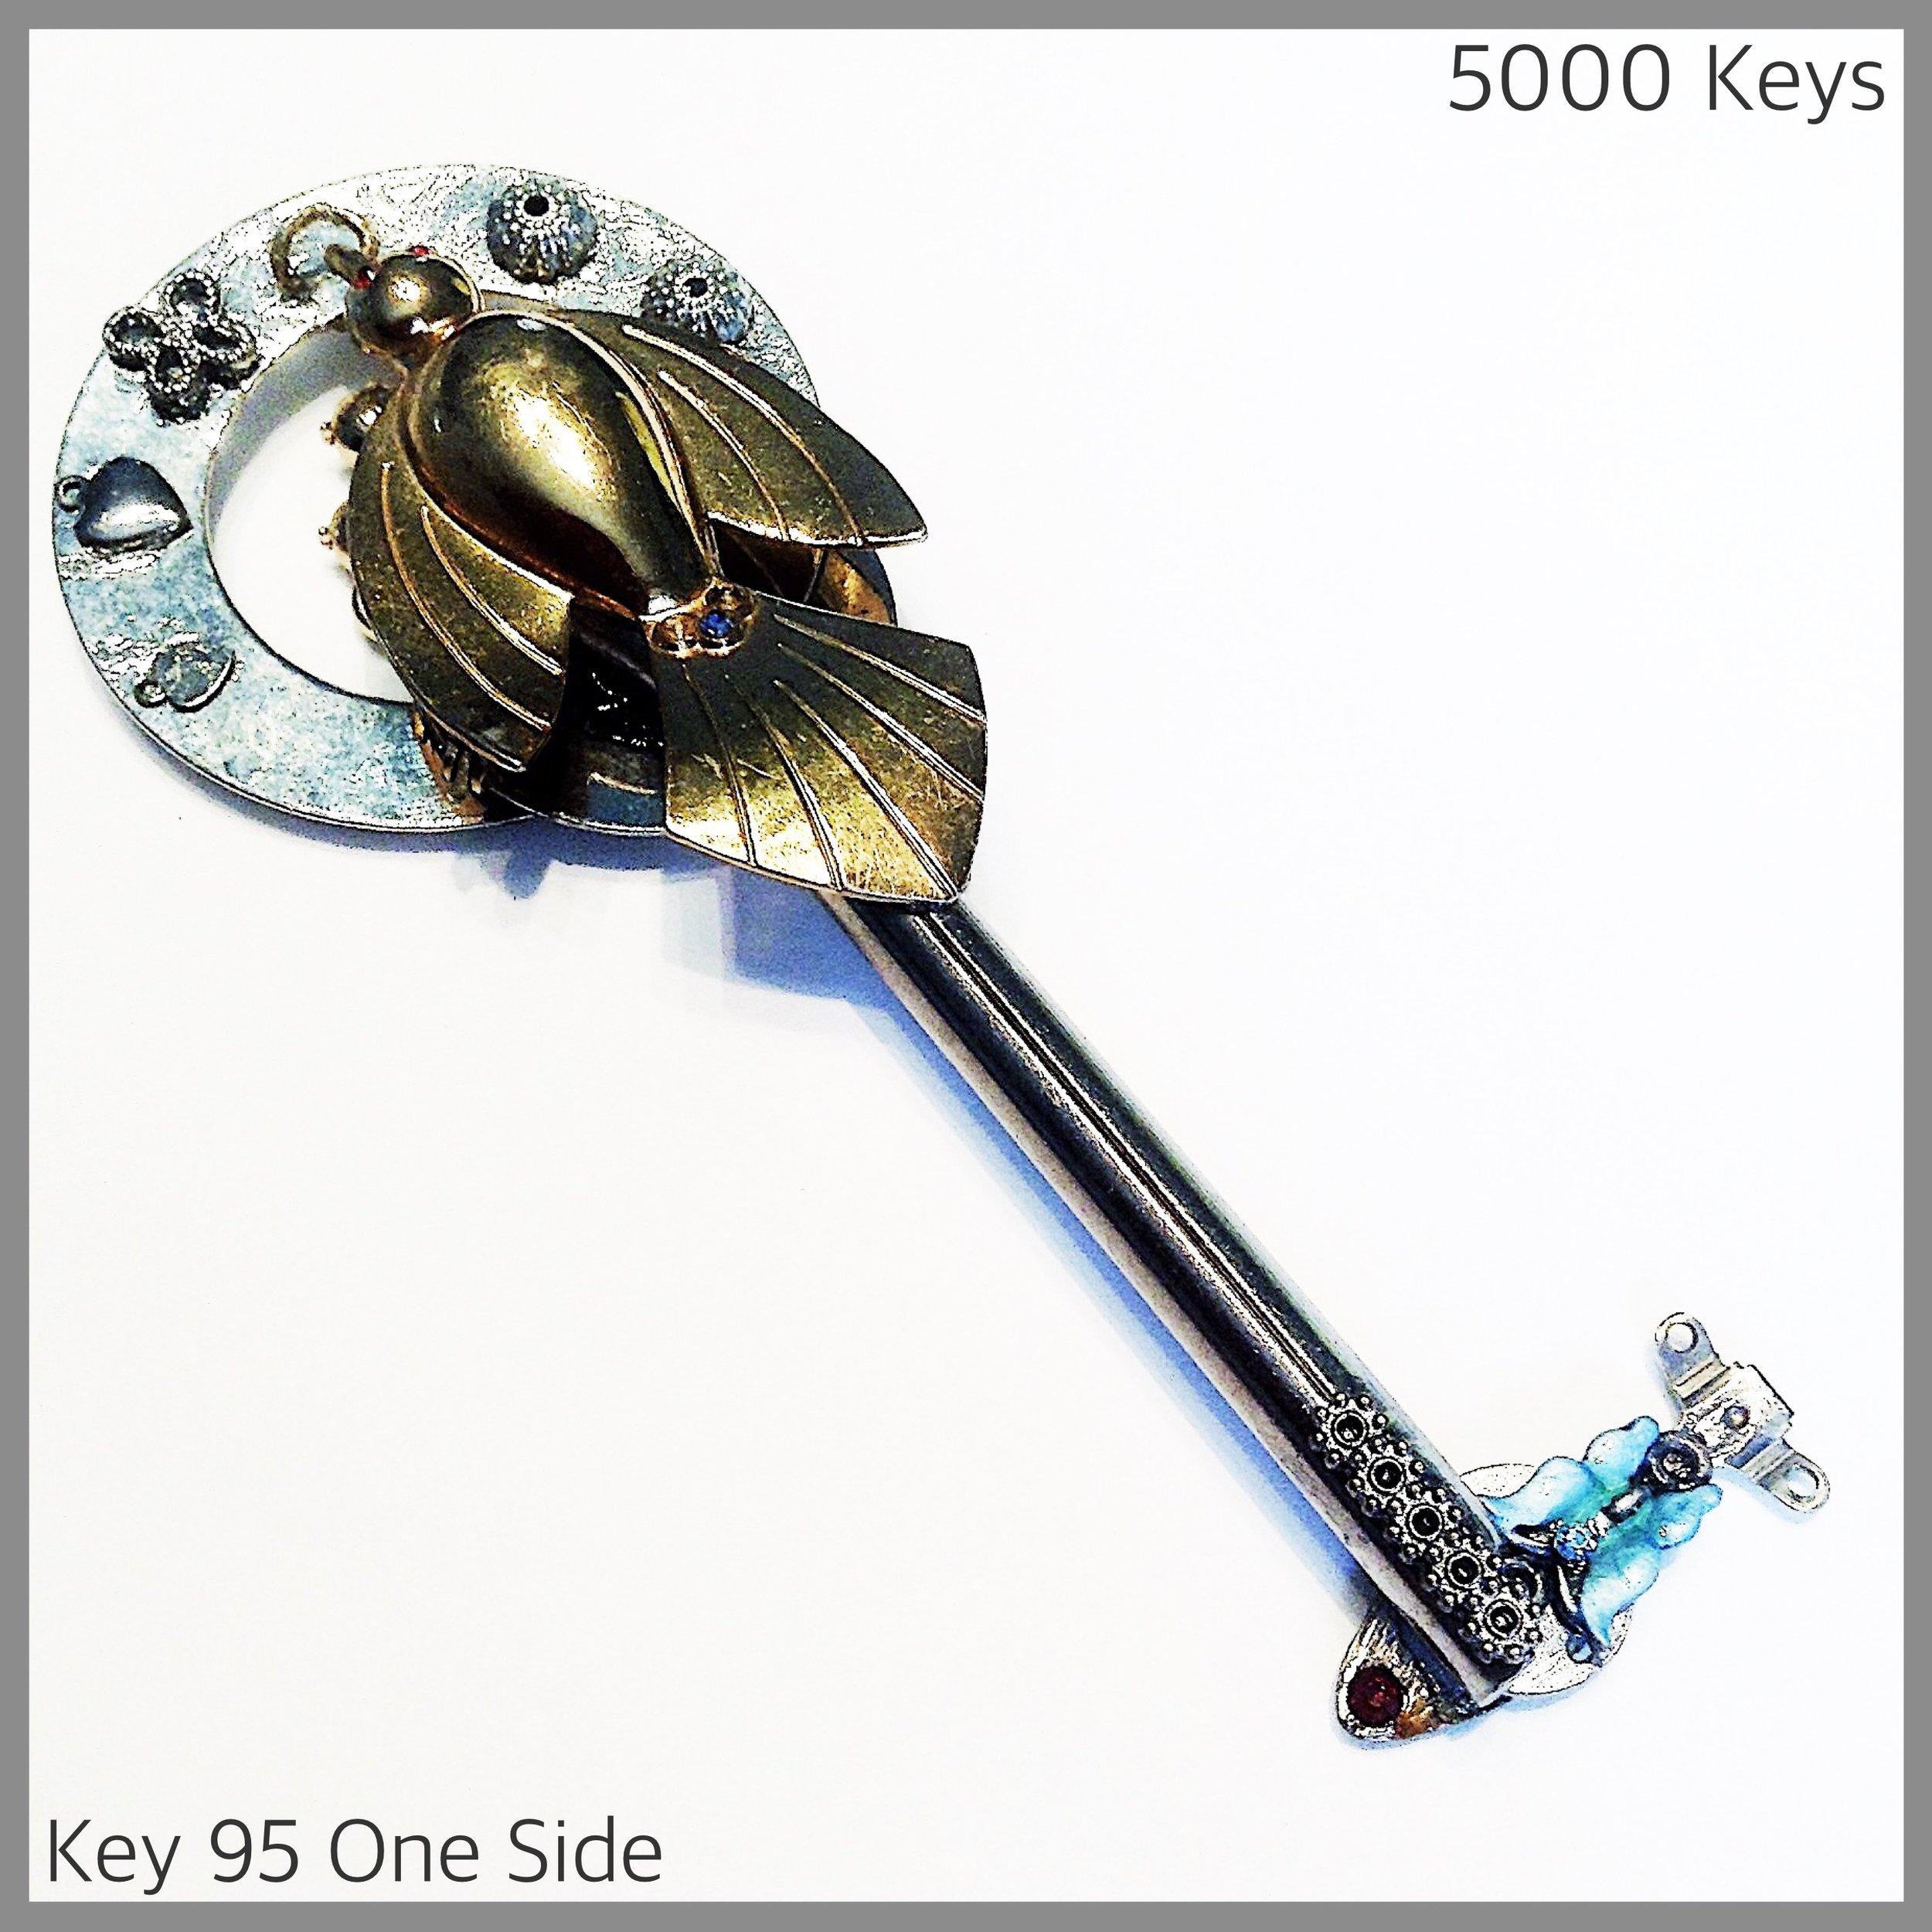 Key 95 one side.jpg